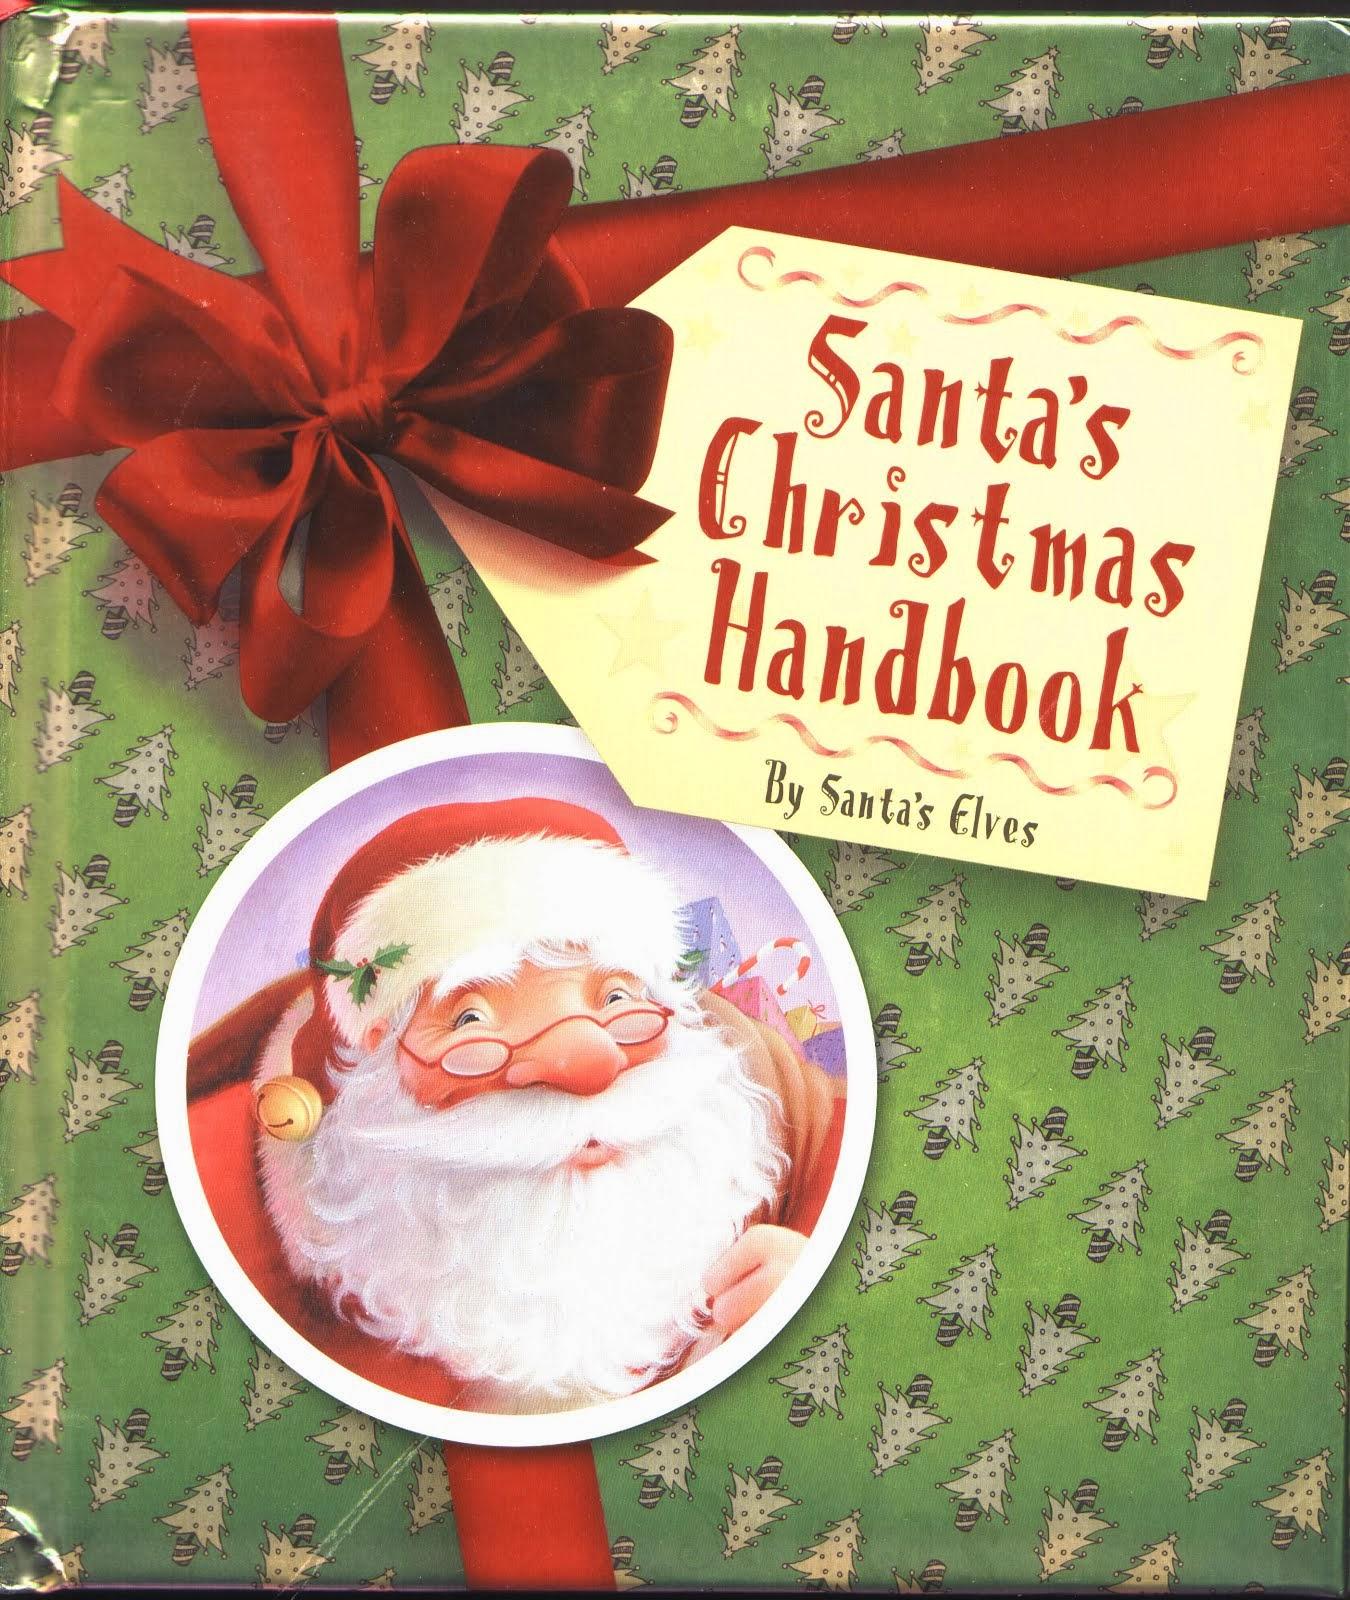 Santa's Christmas Handbook